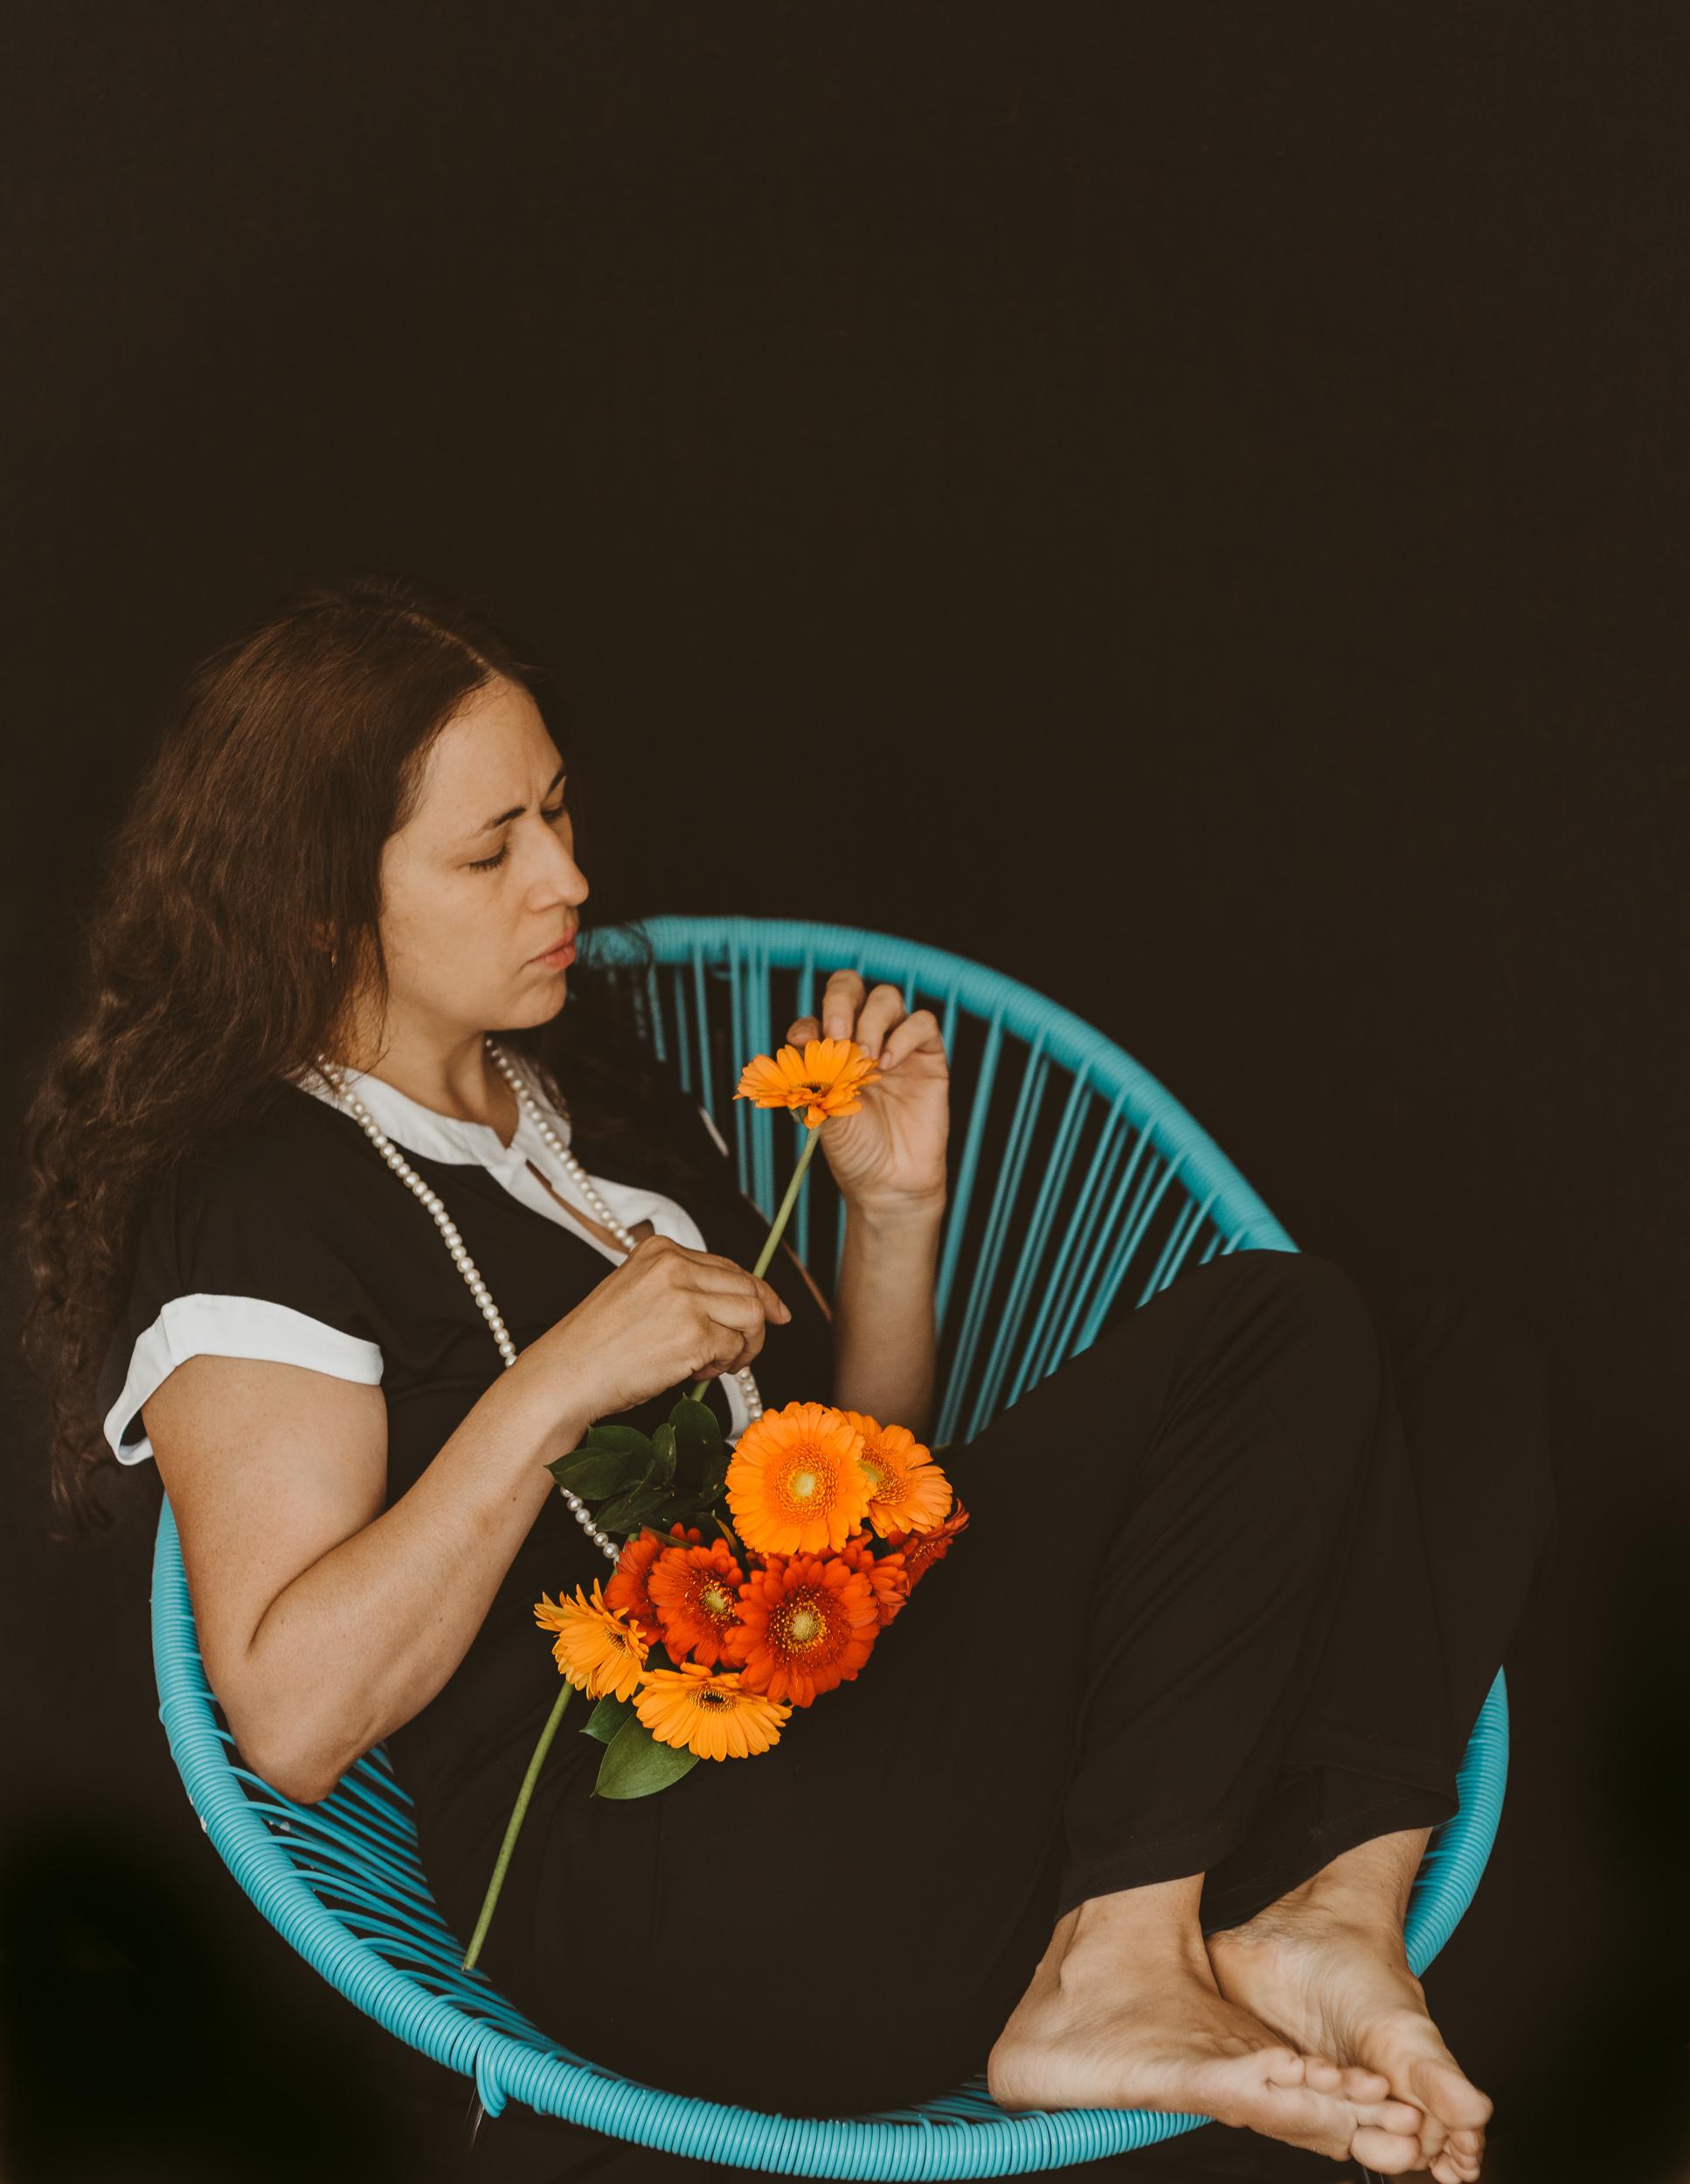 Professional Photography - Toronto, Canada - Ranna Asha Photography